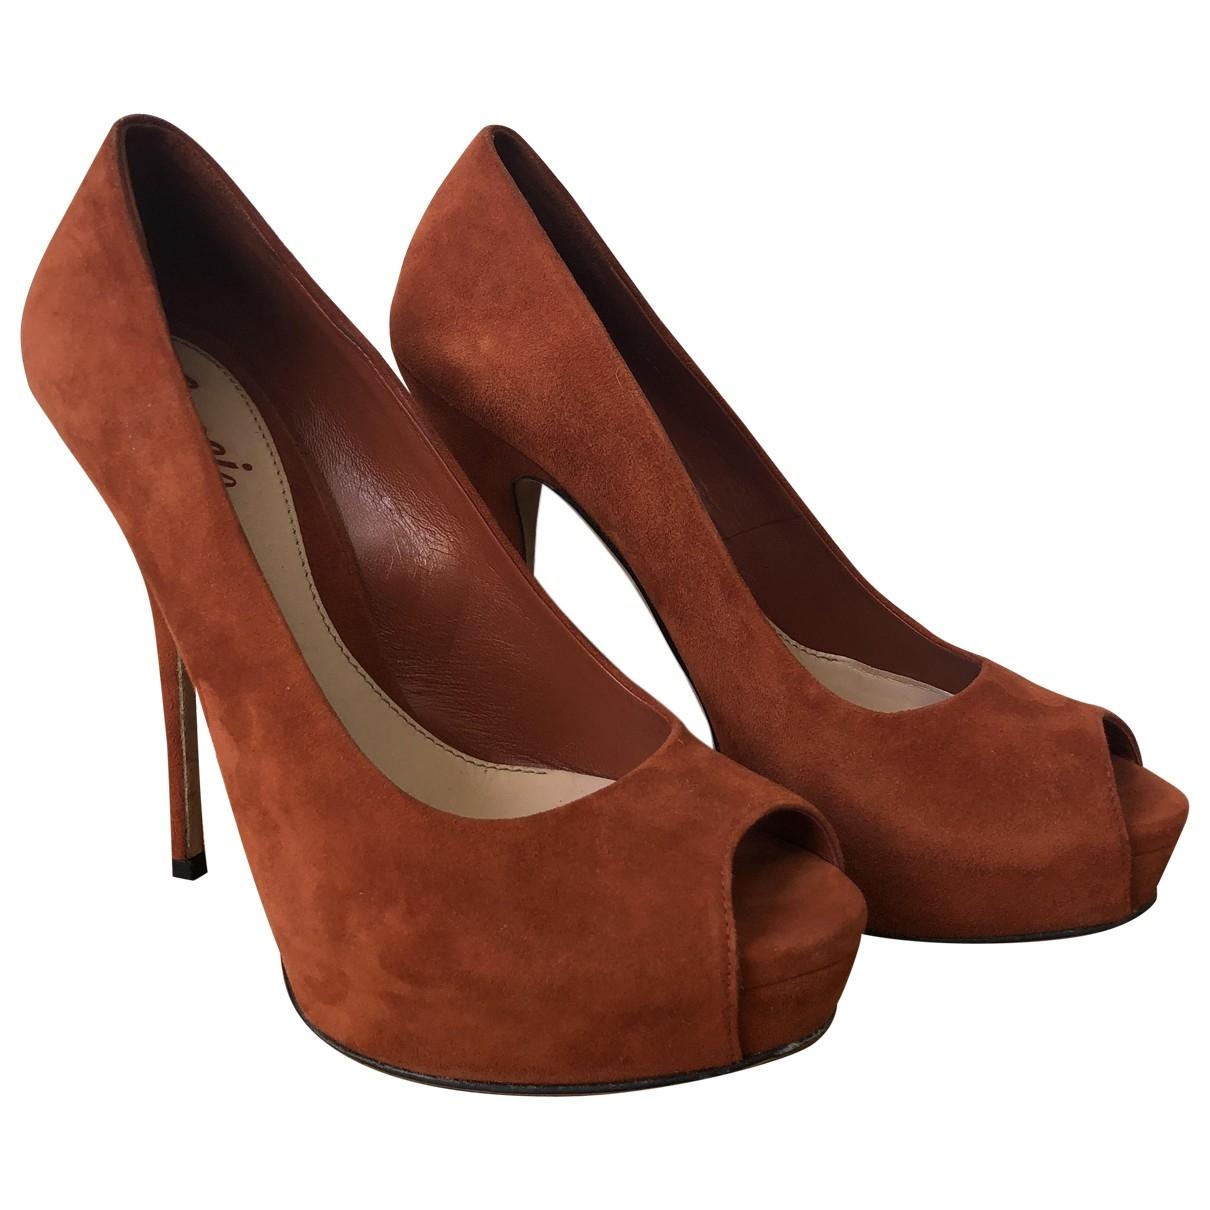 Gucci \N Orange Suede Heels for Women 38 EU